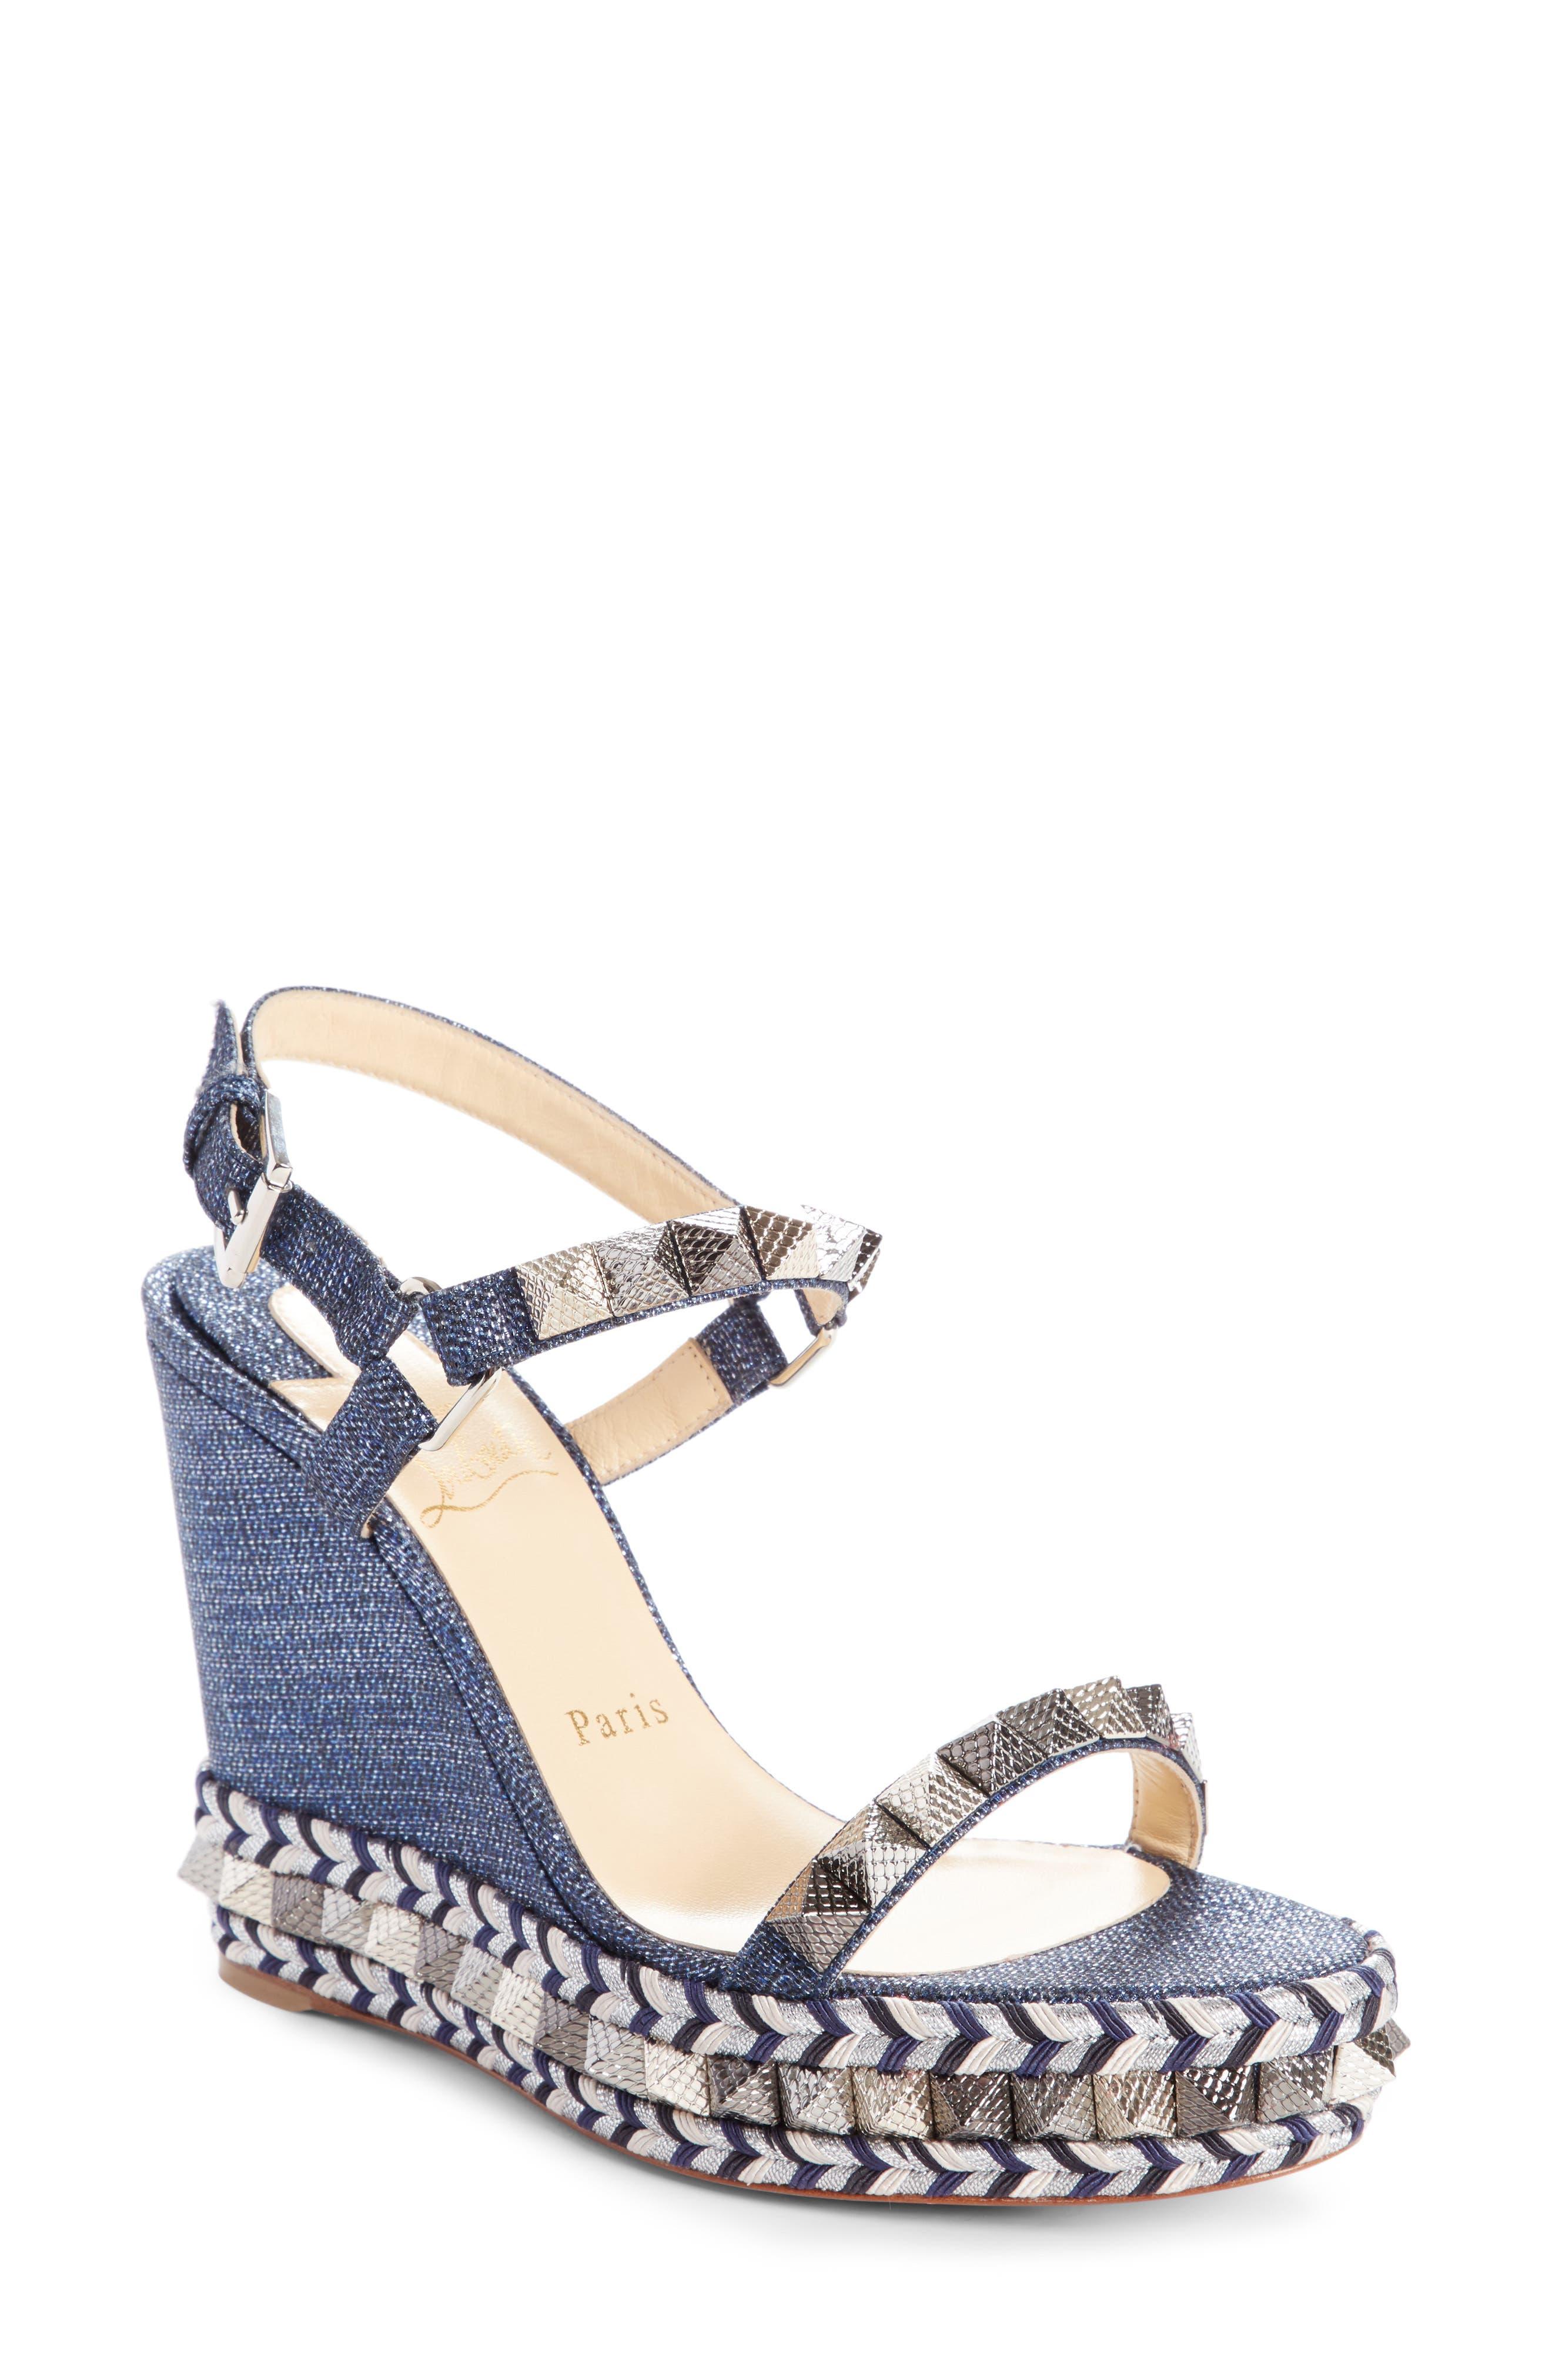 Pyraclou Studded Platform Wedge Sandal,                             Main thumbnail 1, color,                             DENIM